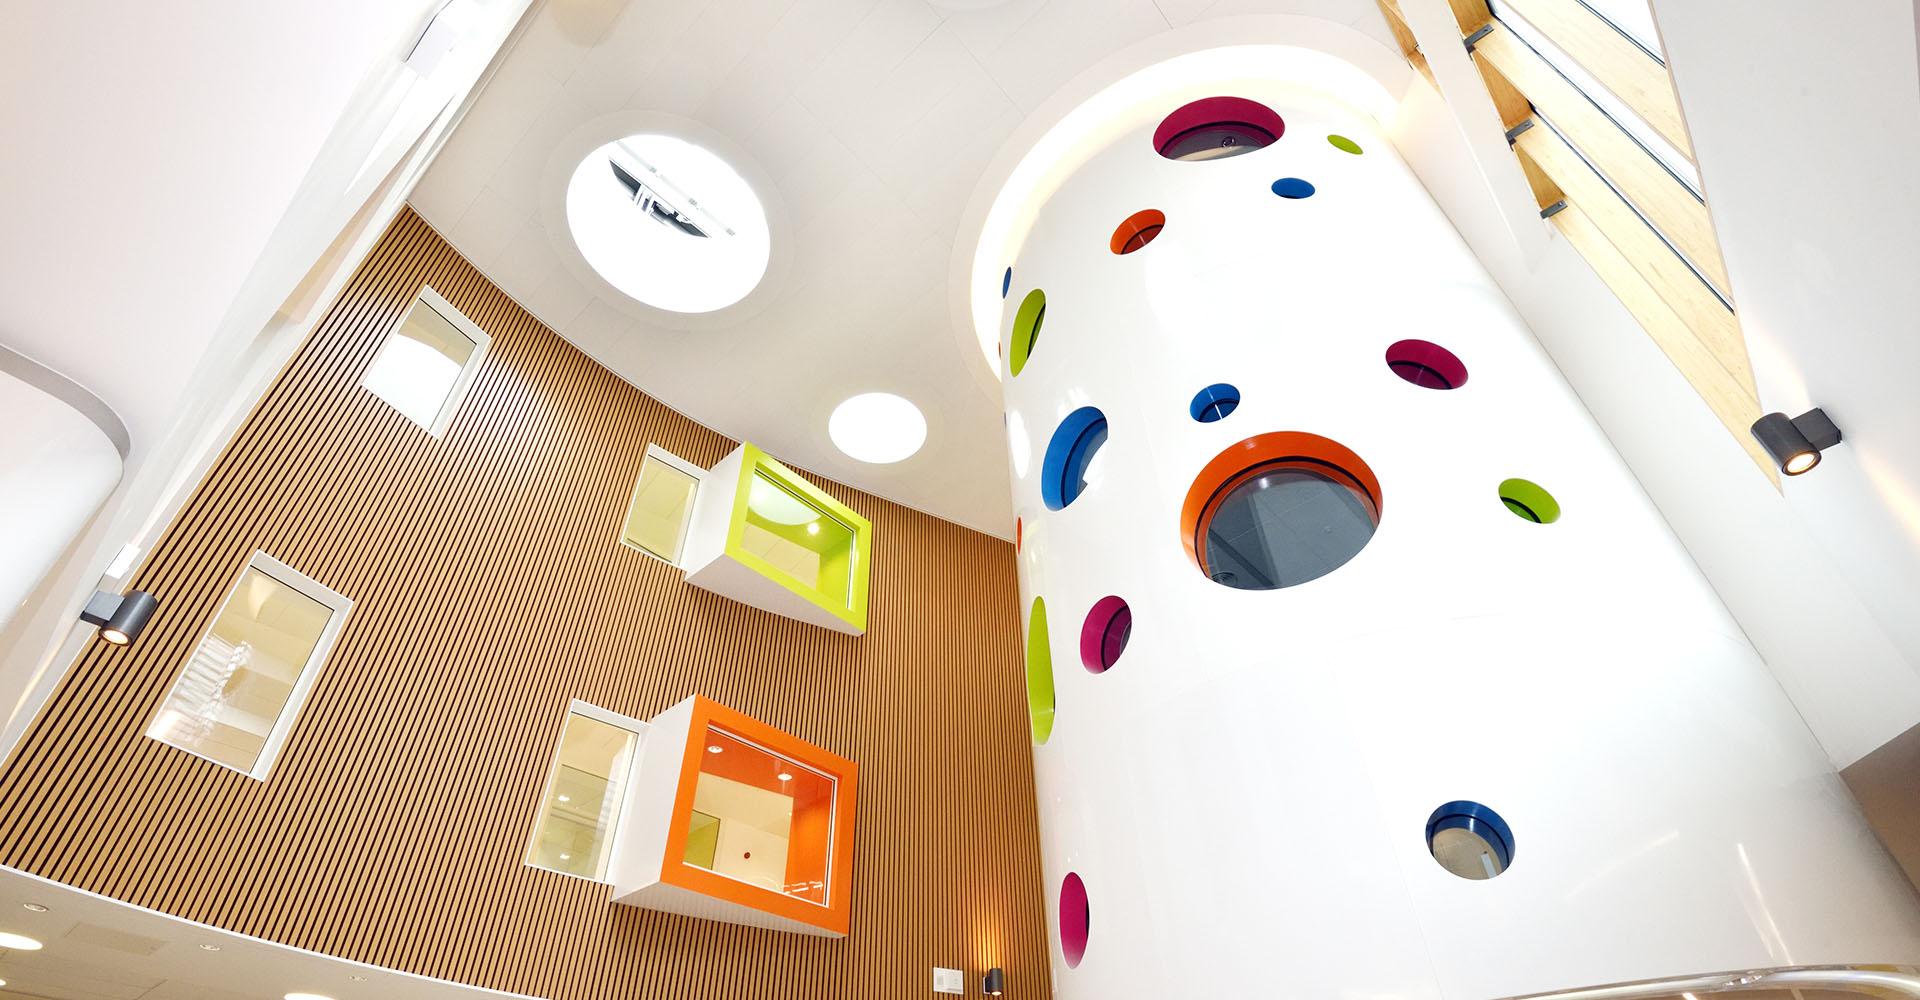 Brightening the children's hospital visit